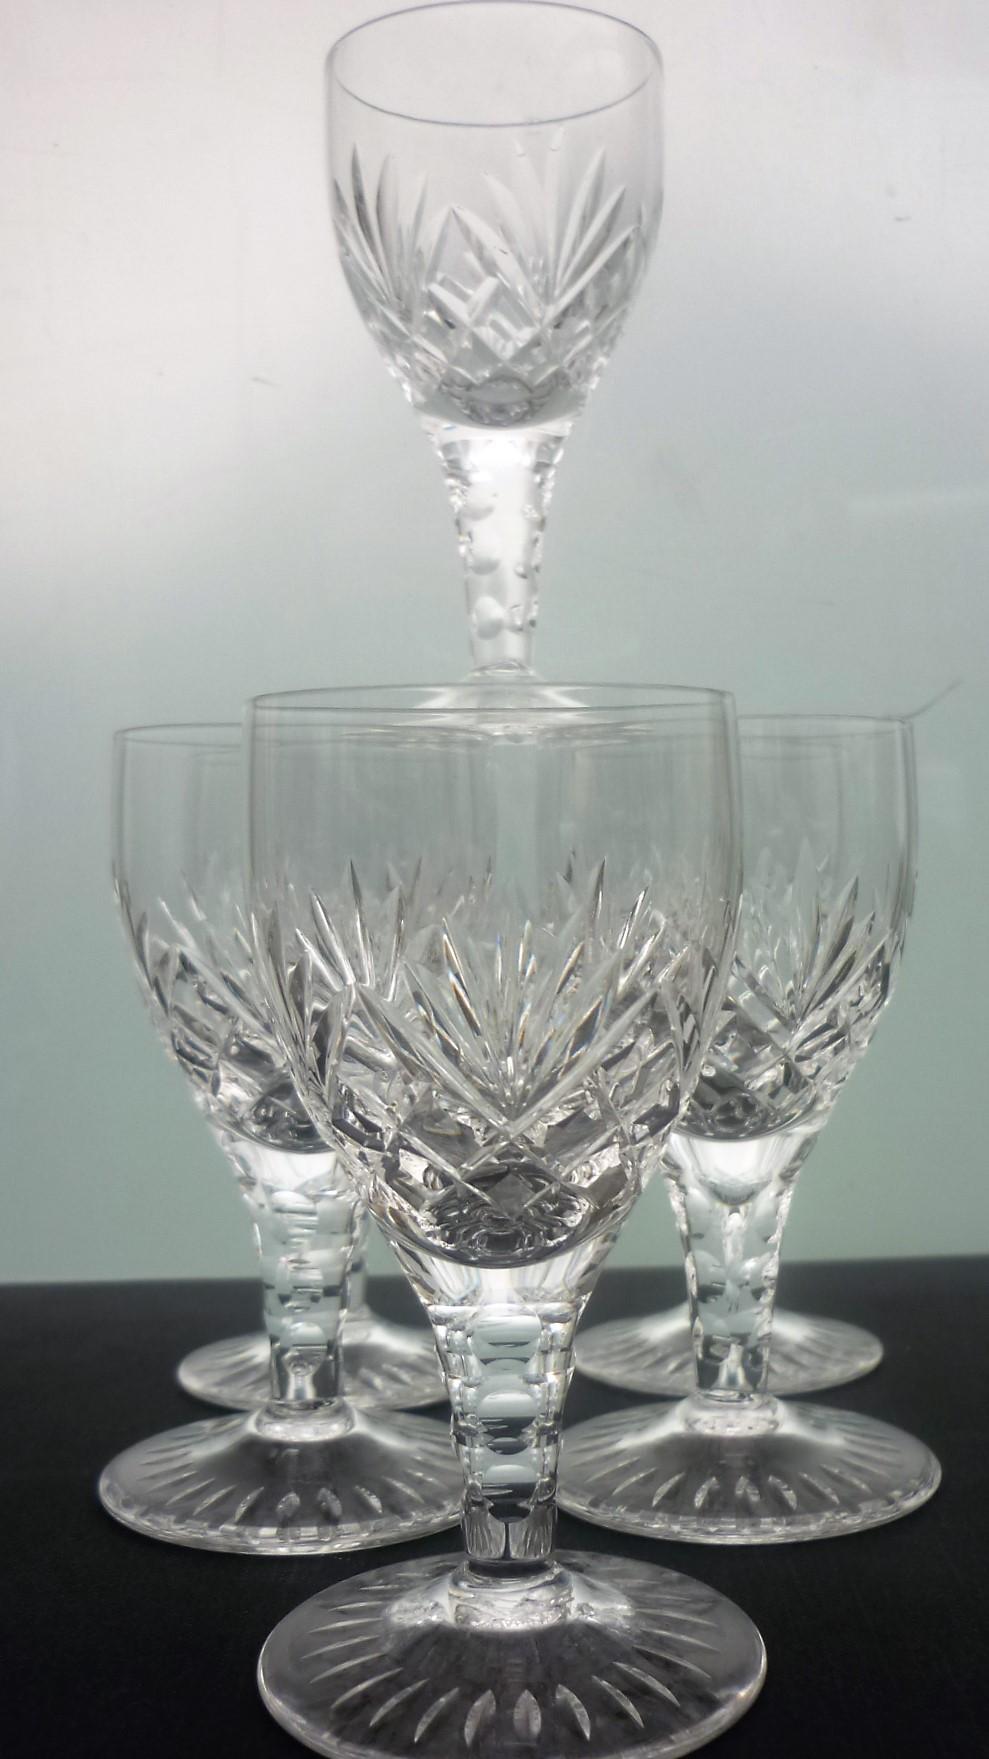 4 Ludlow Pattern Stuart Crystal Sherry glasses.